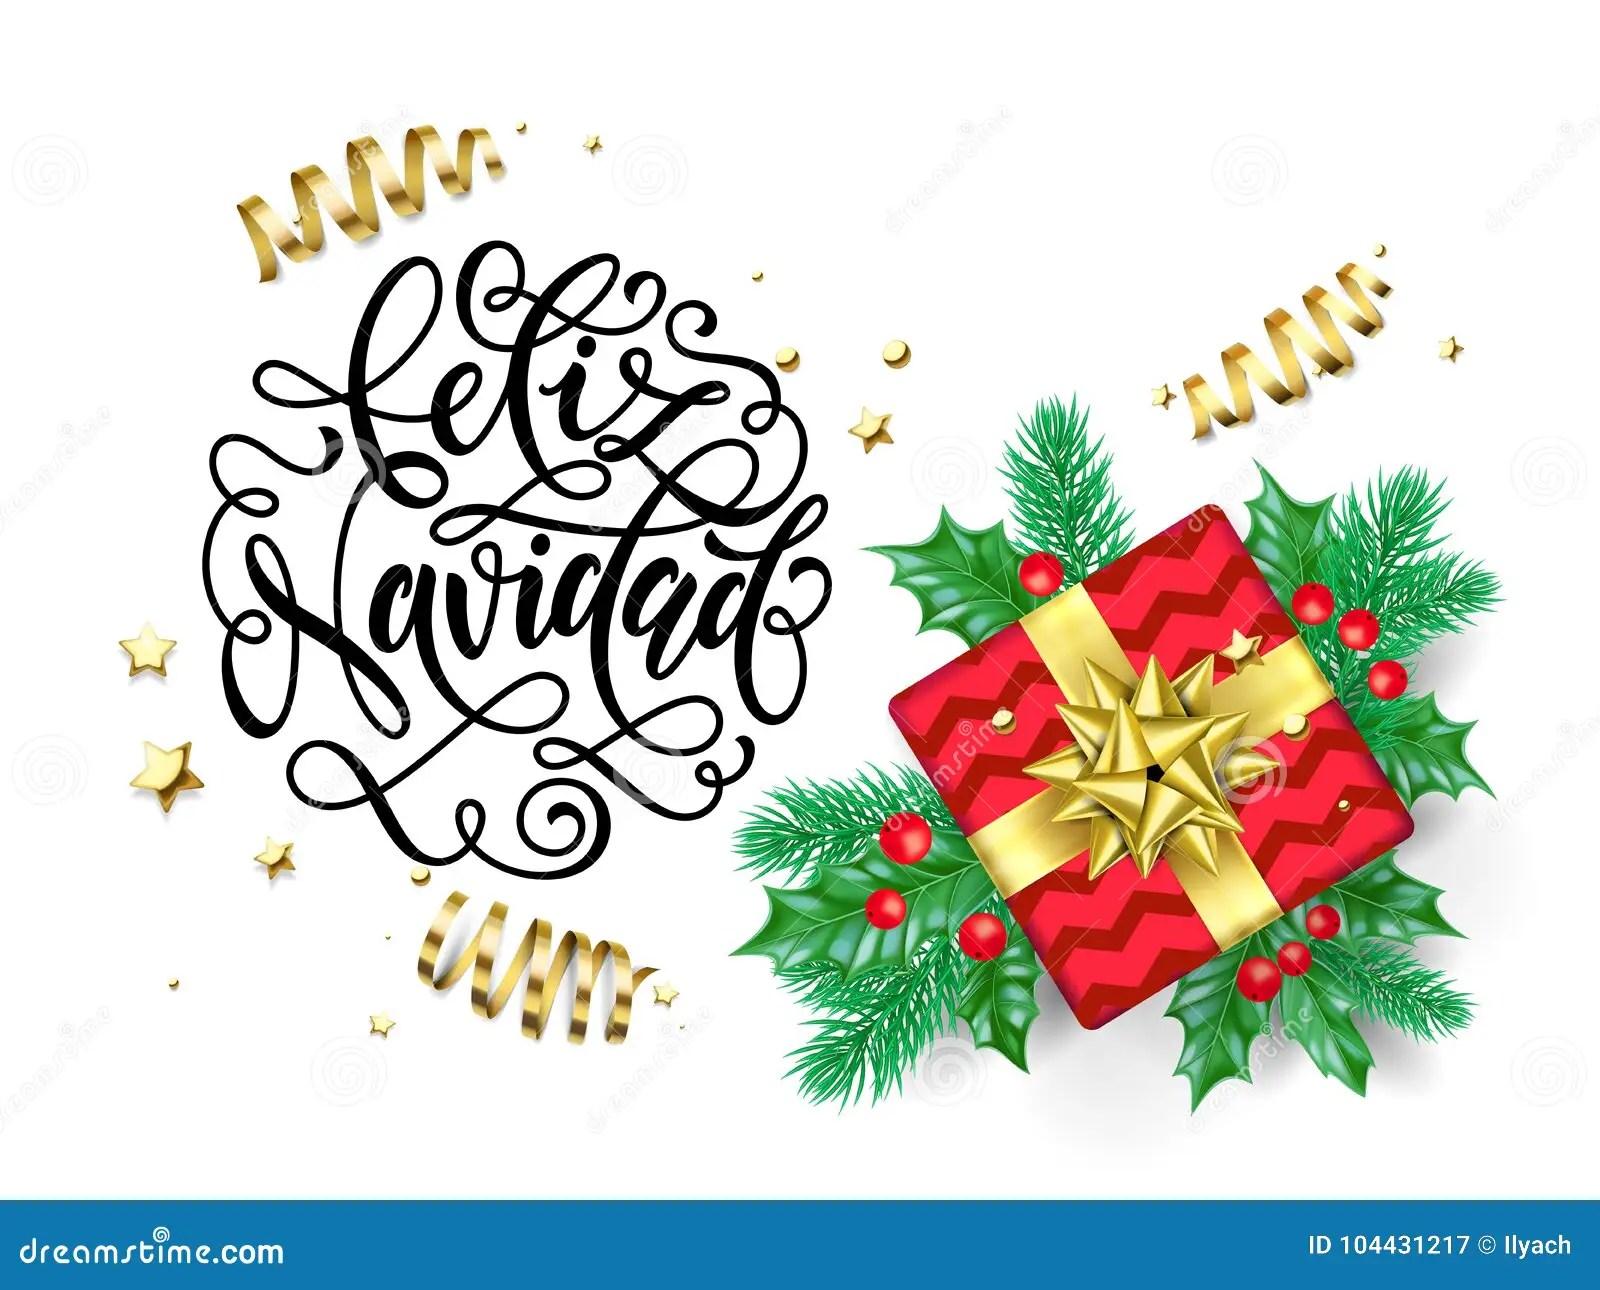 Feliz Navidad Spanish Merry Christmas Hand Drawn